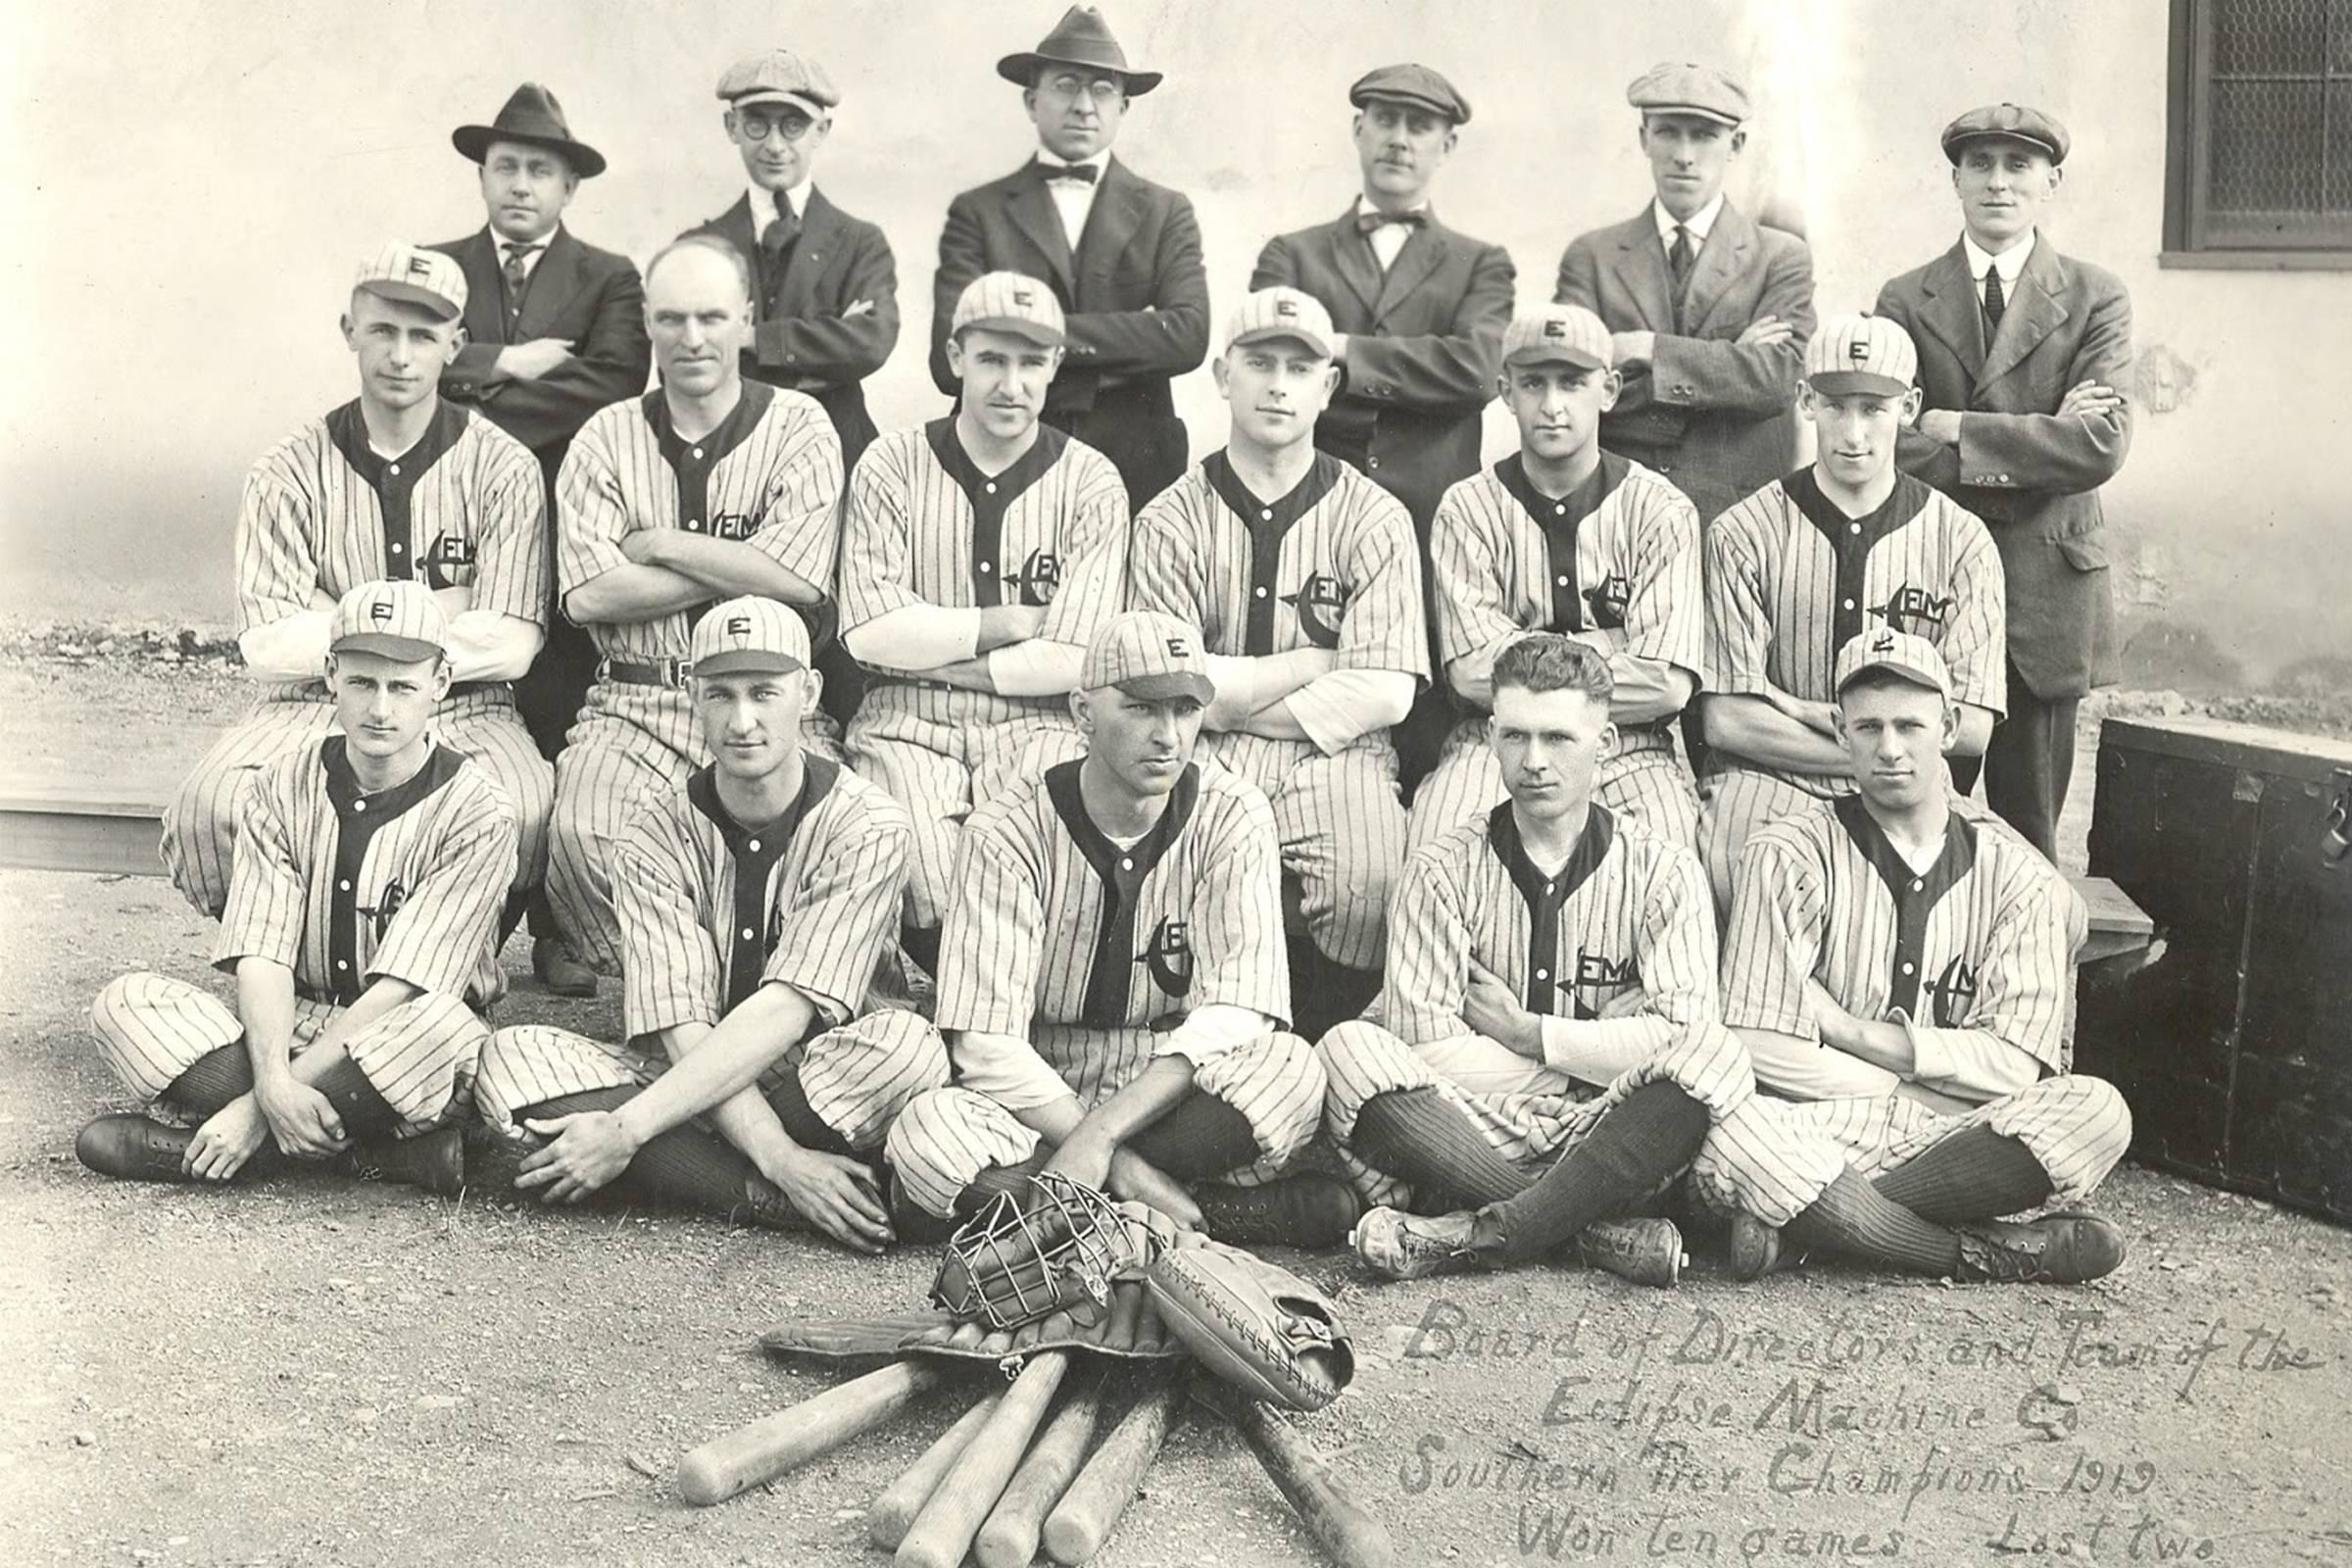 The New York Knickerbocker Base Ball Club, late 1800s